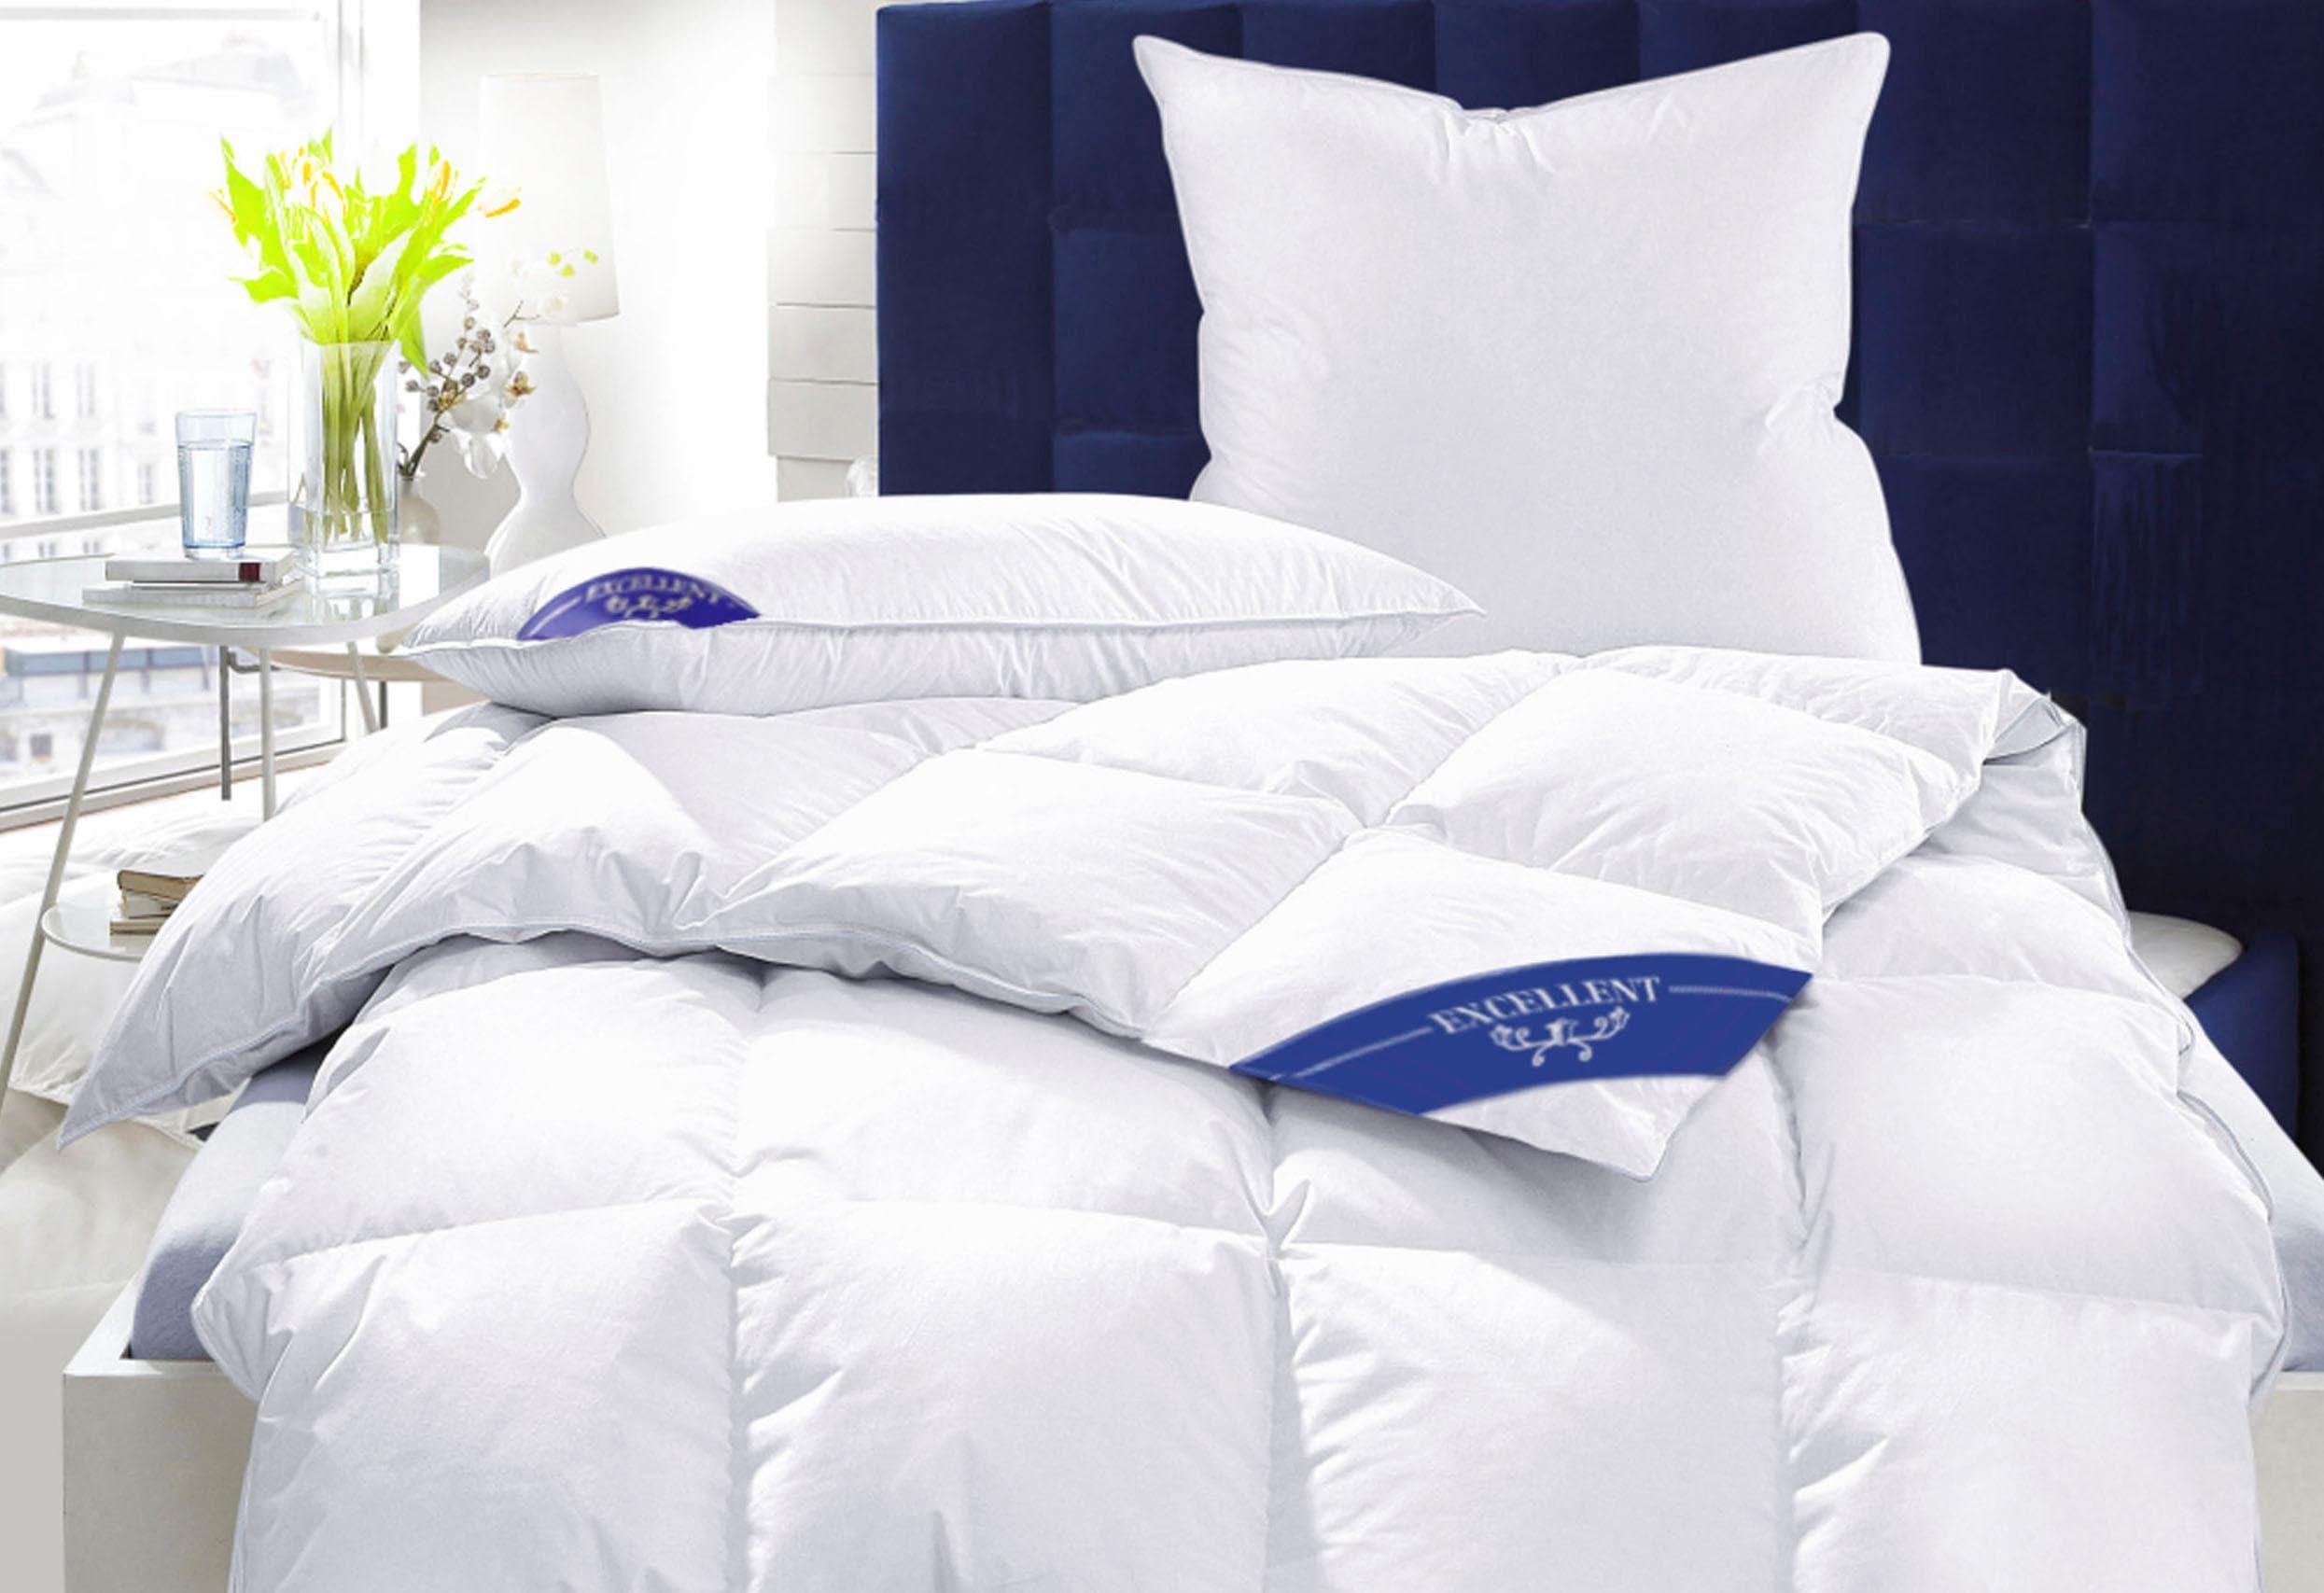 100 daunen kopfkissen 80x80 schlafzimmer ideen wandgestaltung grau wandtattoo sterne. Black Bedroom Furniture Sets. Home Design Ideas